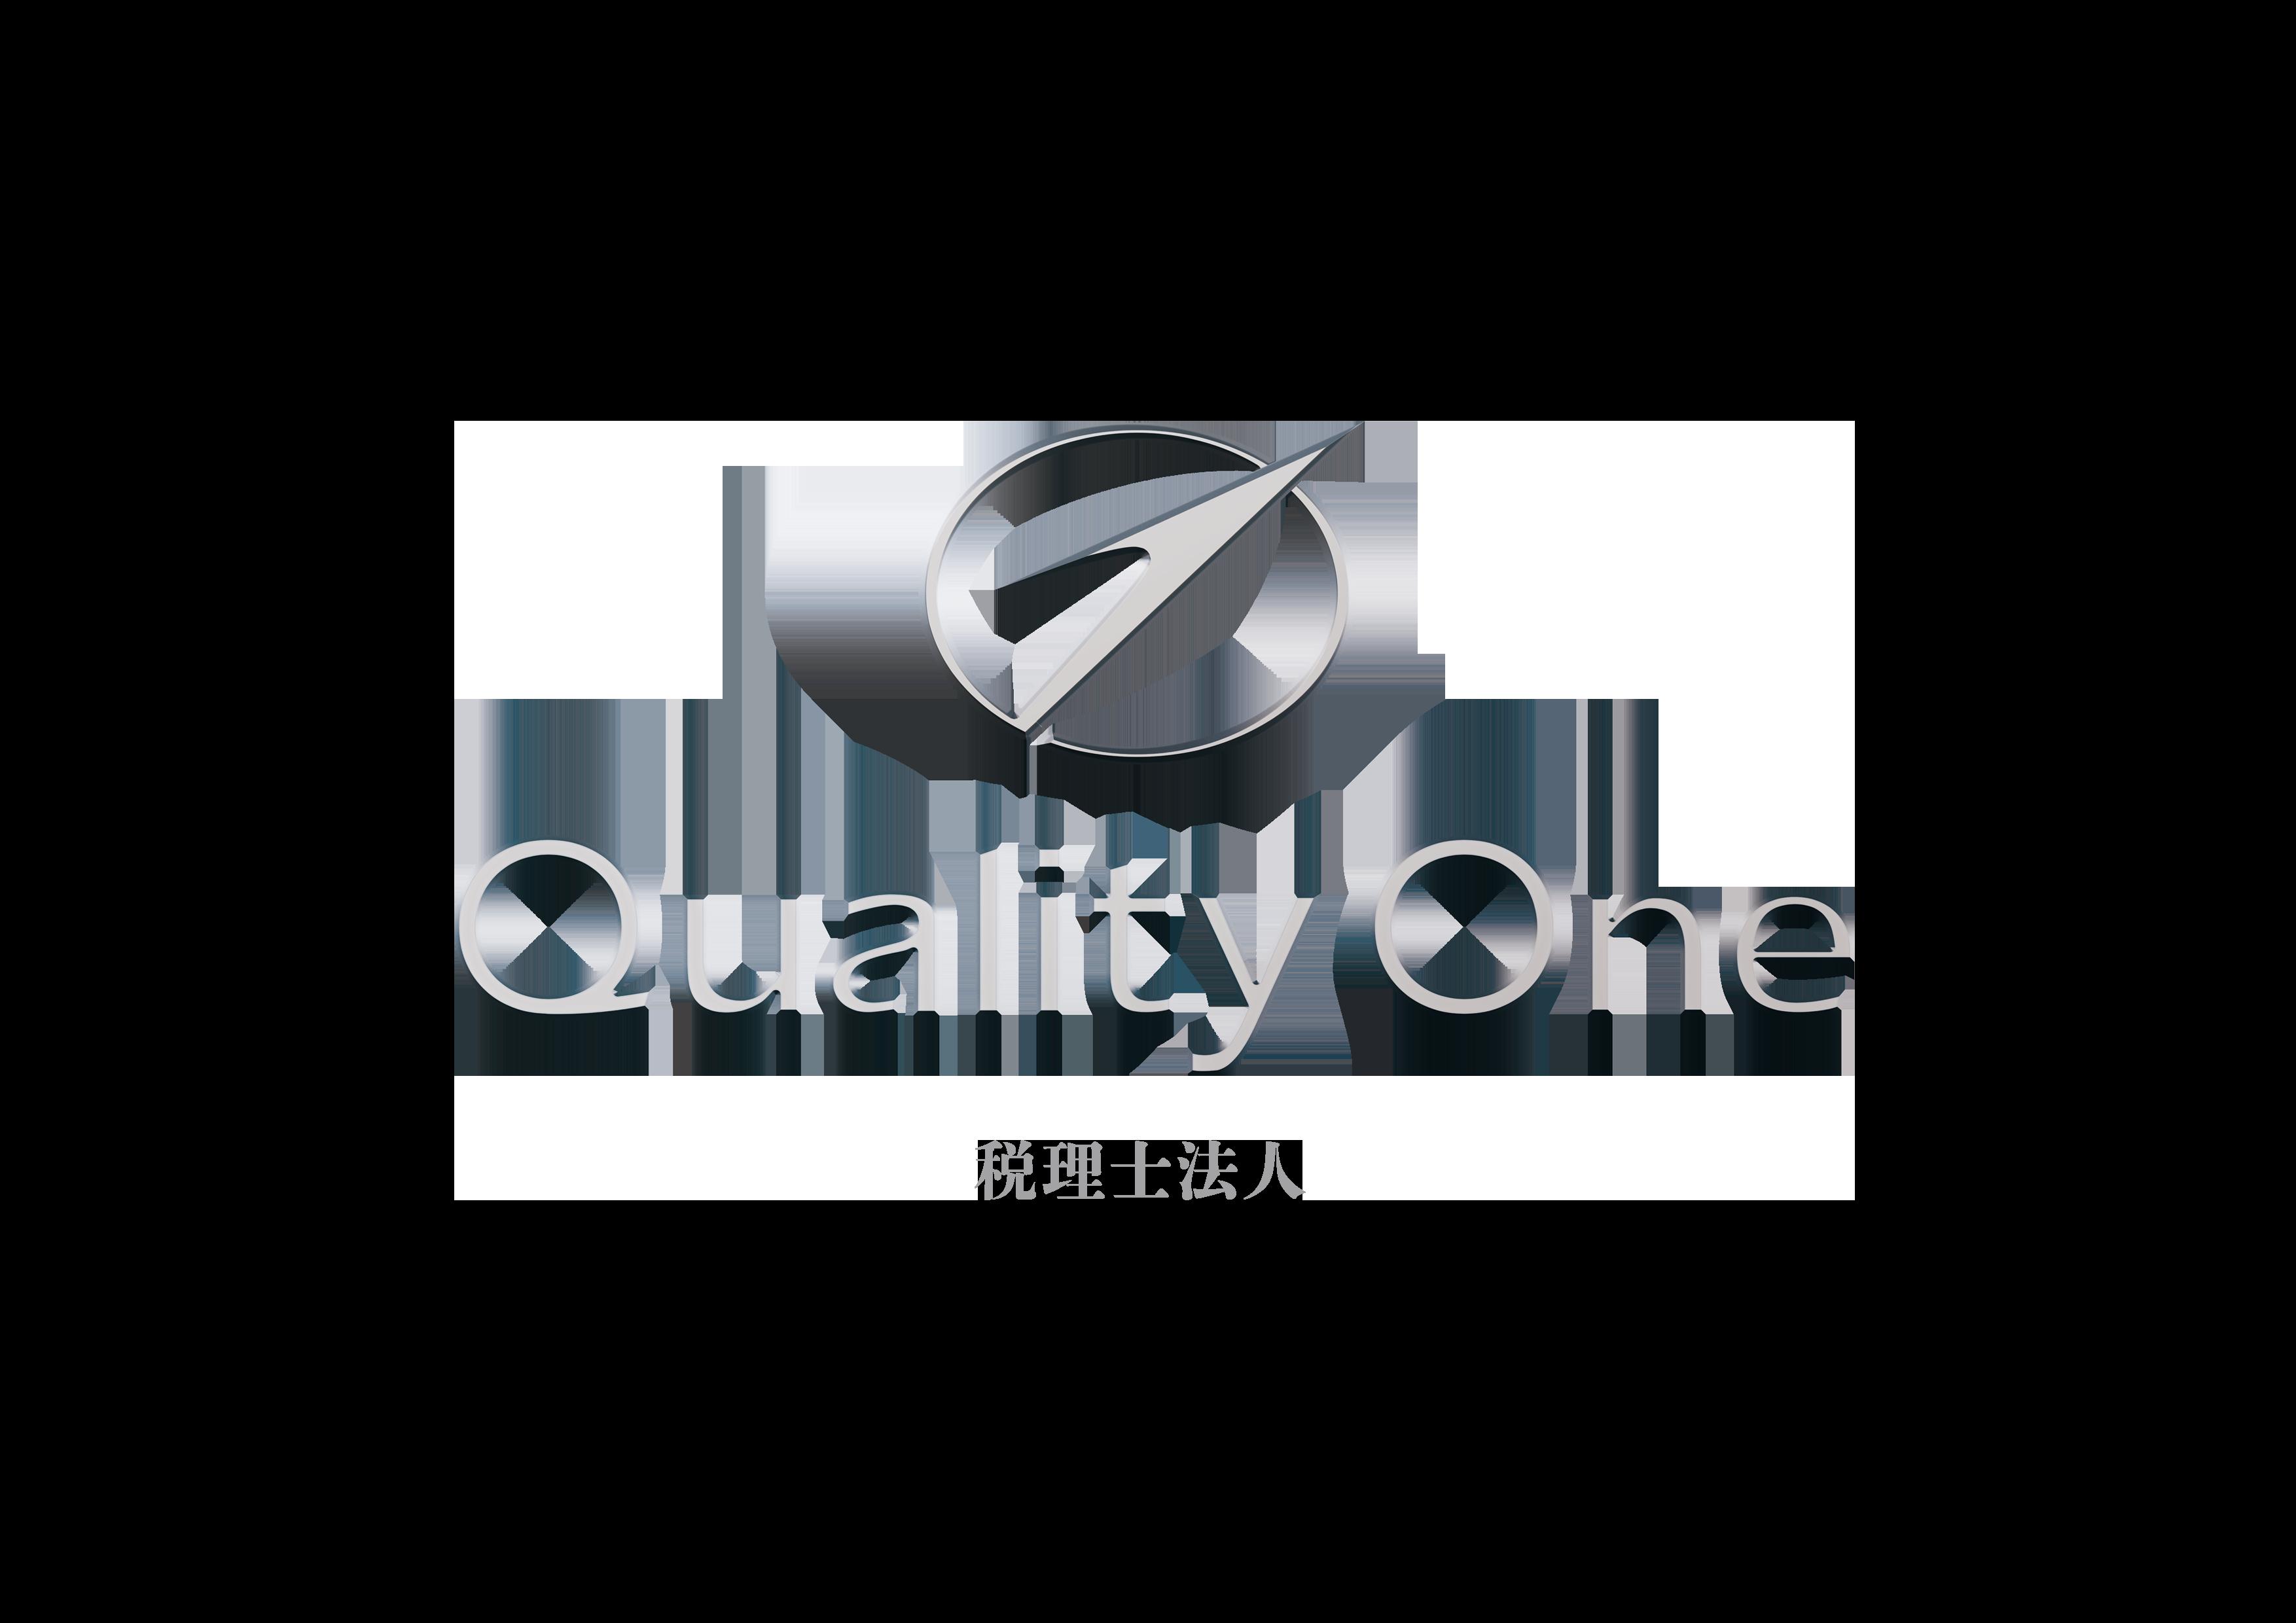 Quality One 税理士法人